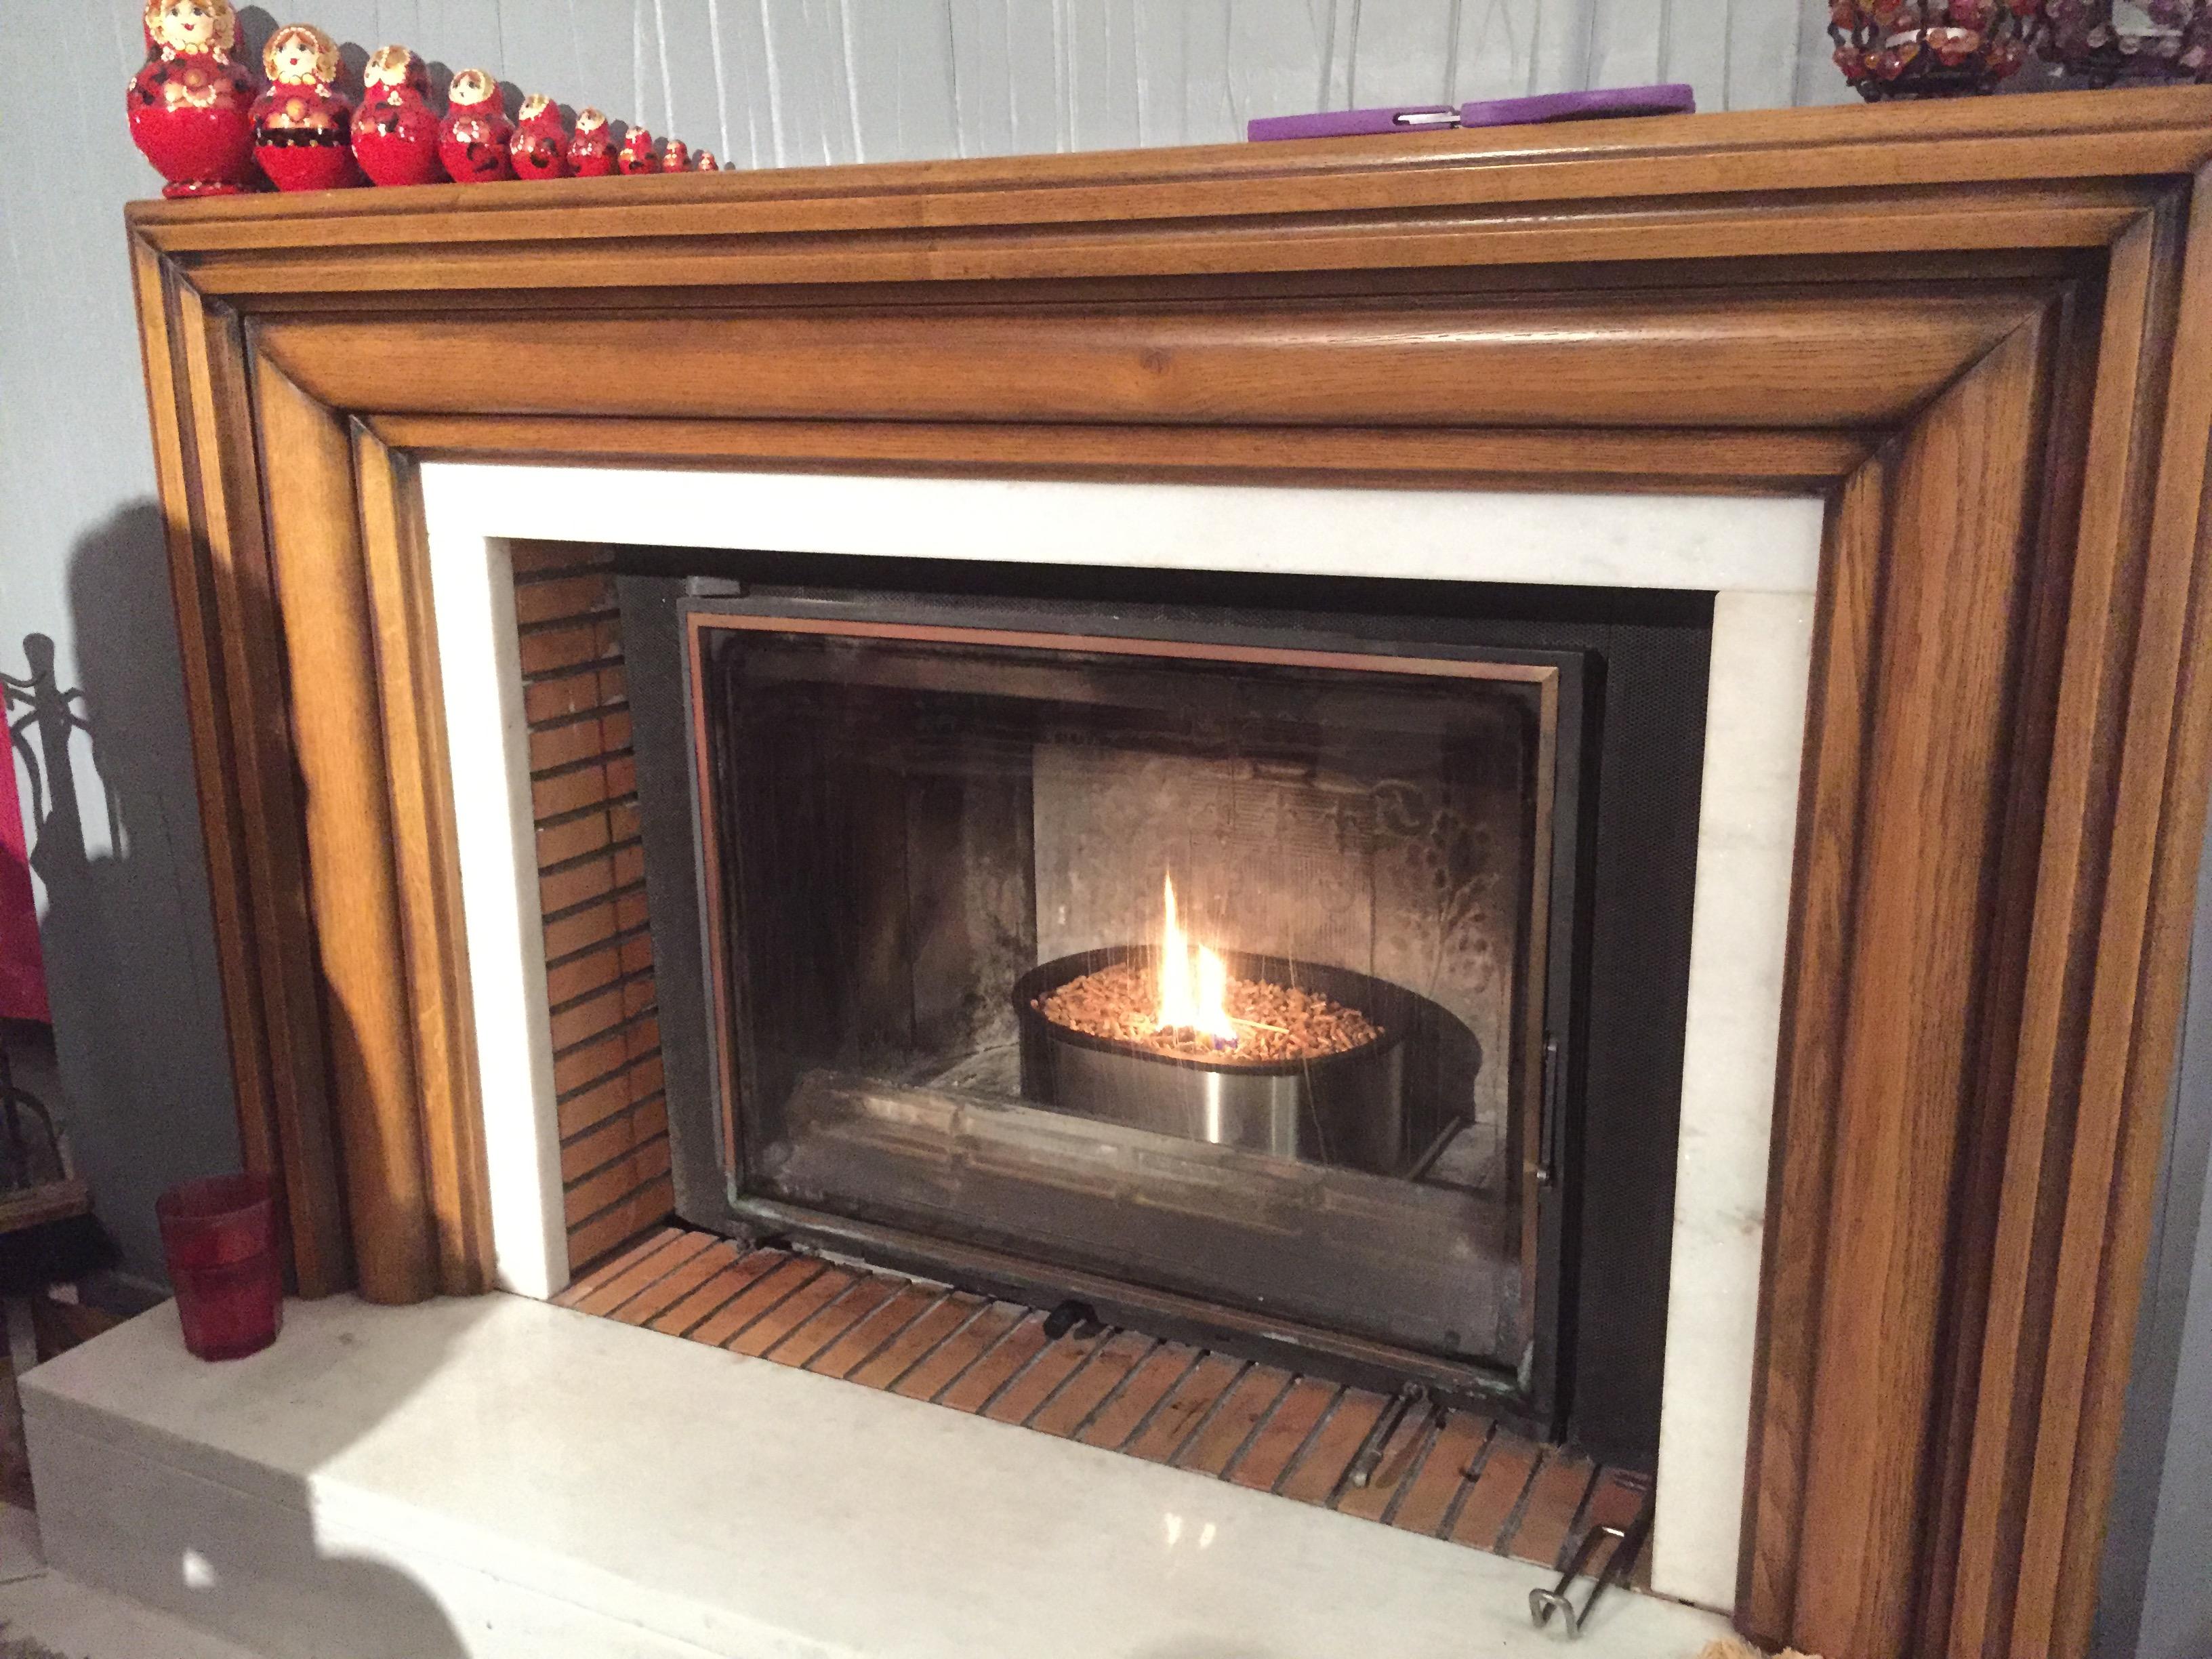 acheter qa to 30 pour grands inserts ou po les bois de grand volume qa to. Black Bedroom Furniture Sets. Home Design Ideas